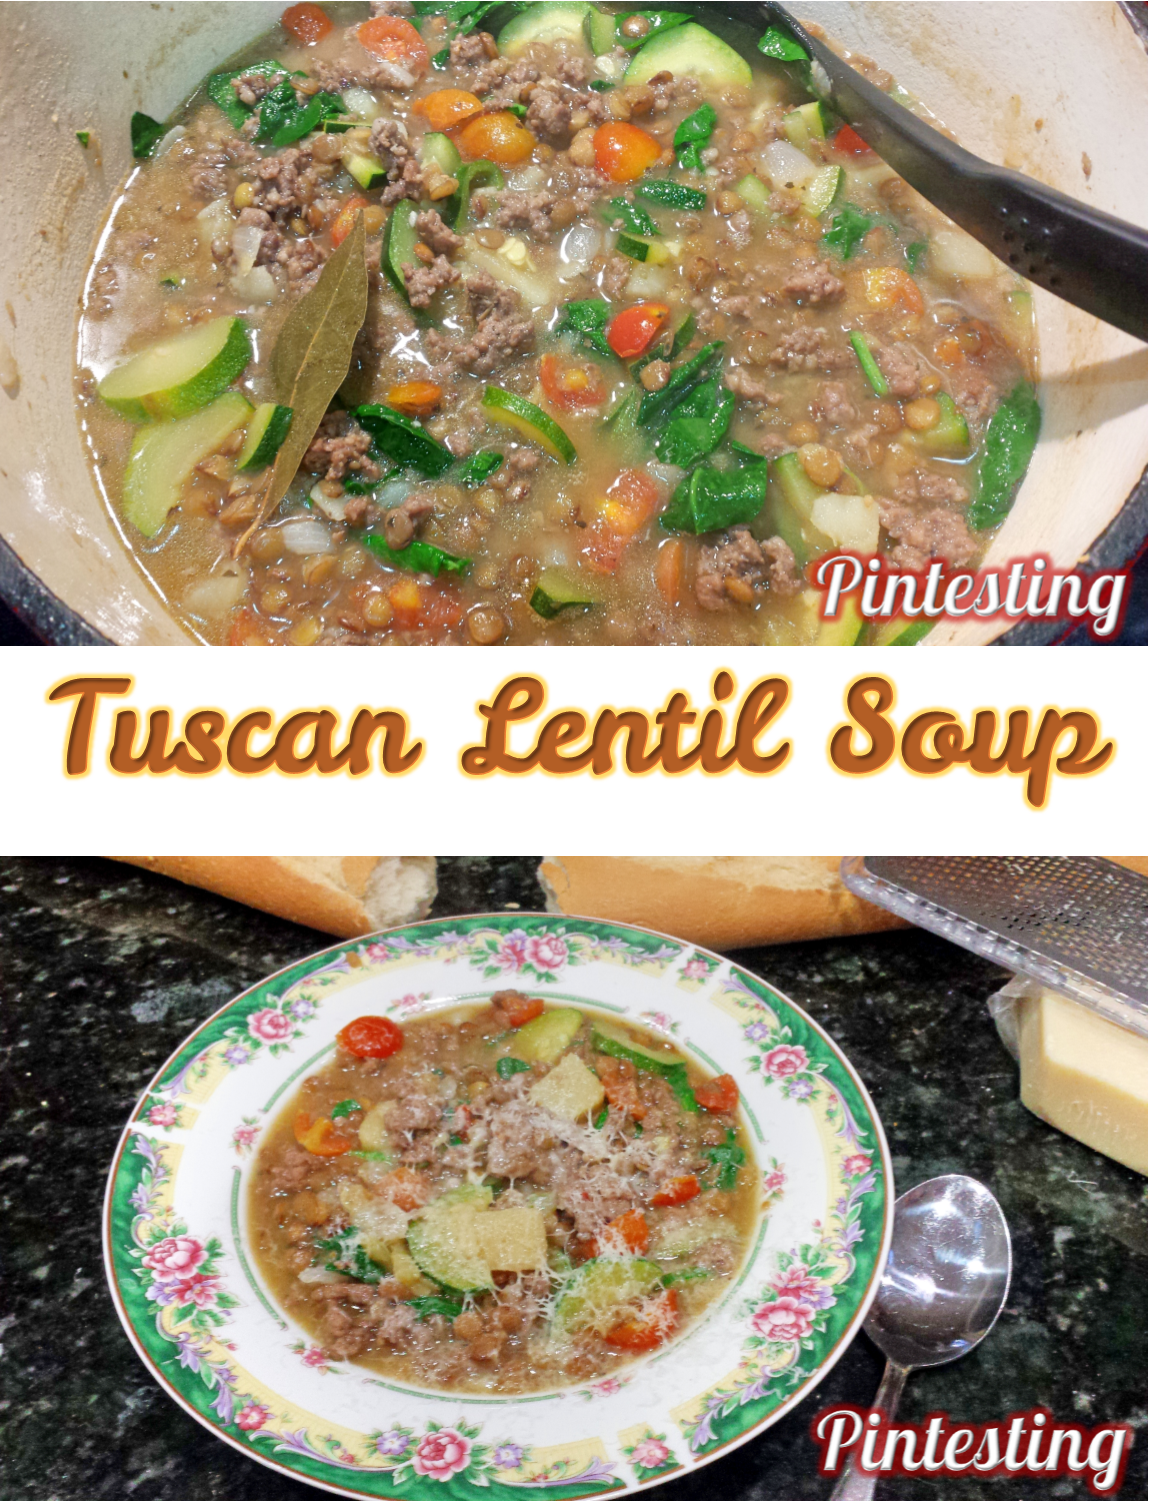 Pintesting Tuscan Lentil Soup